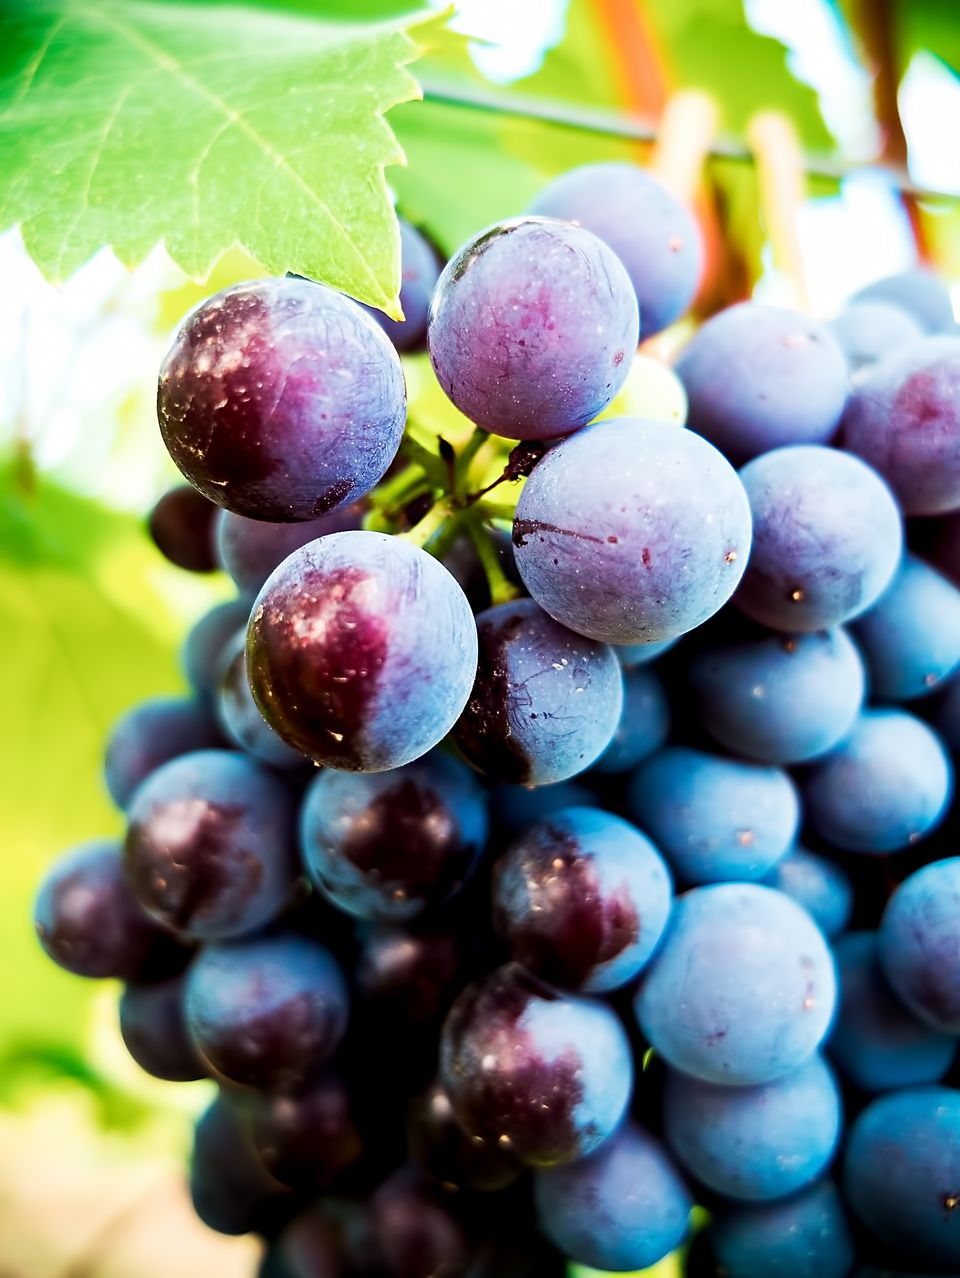 Close-Up Of Ripe Grapes